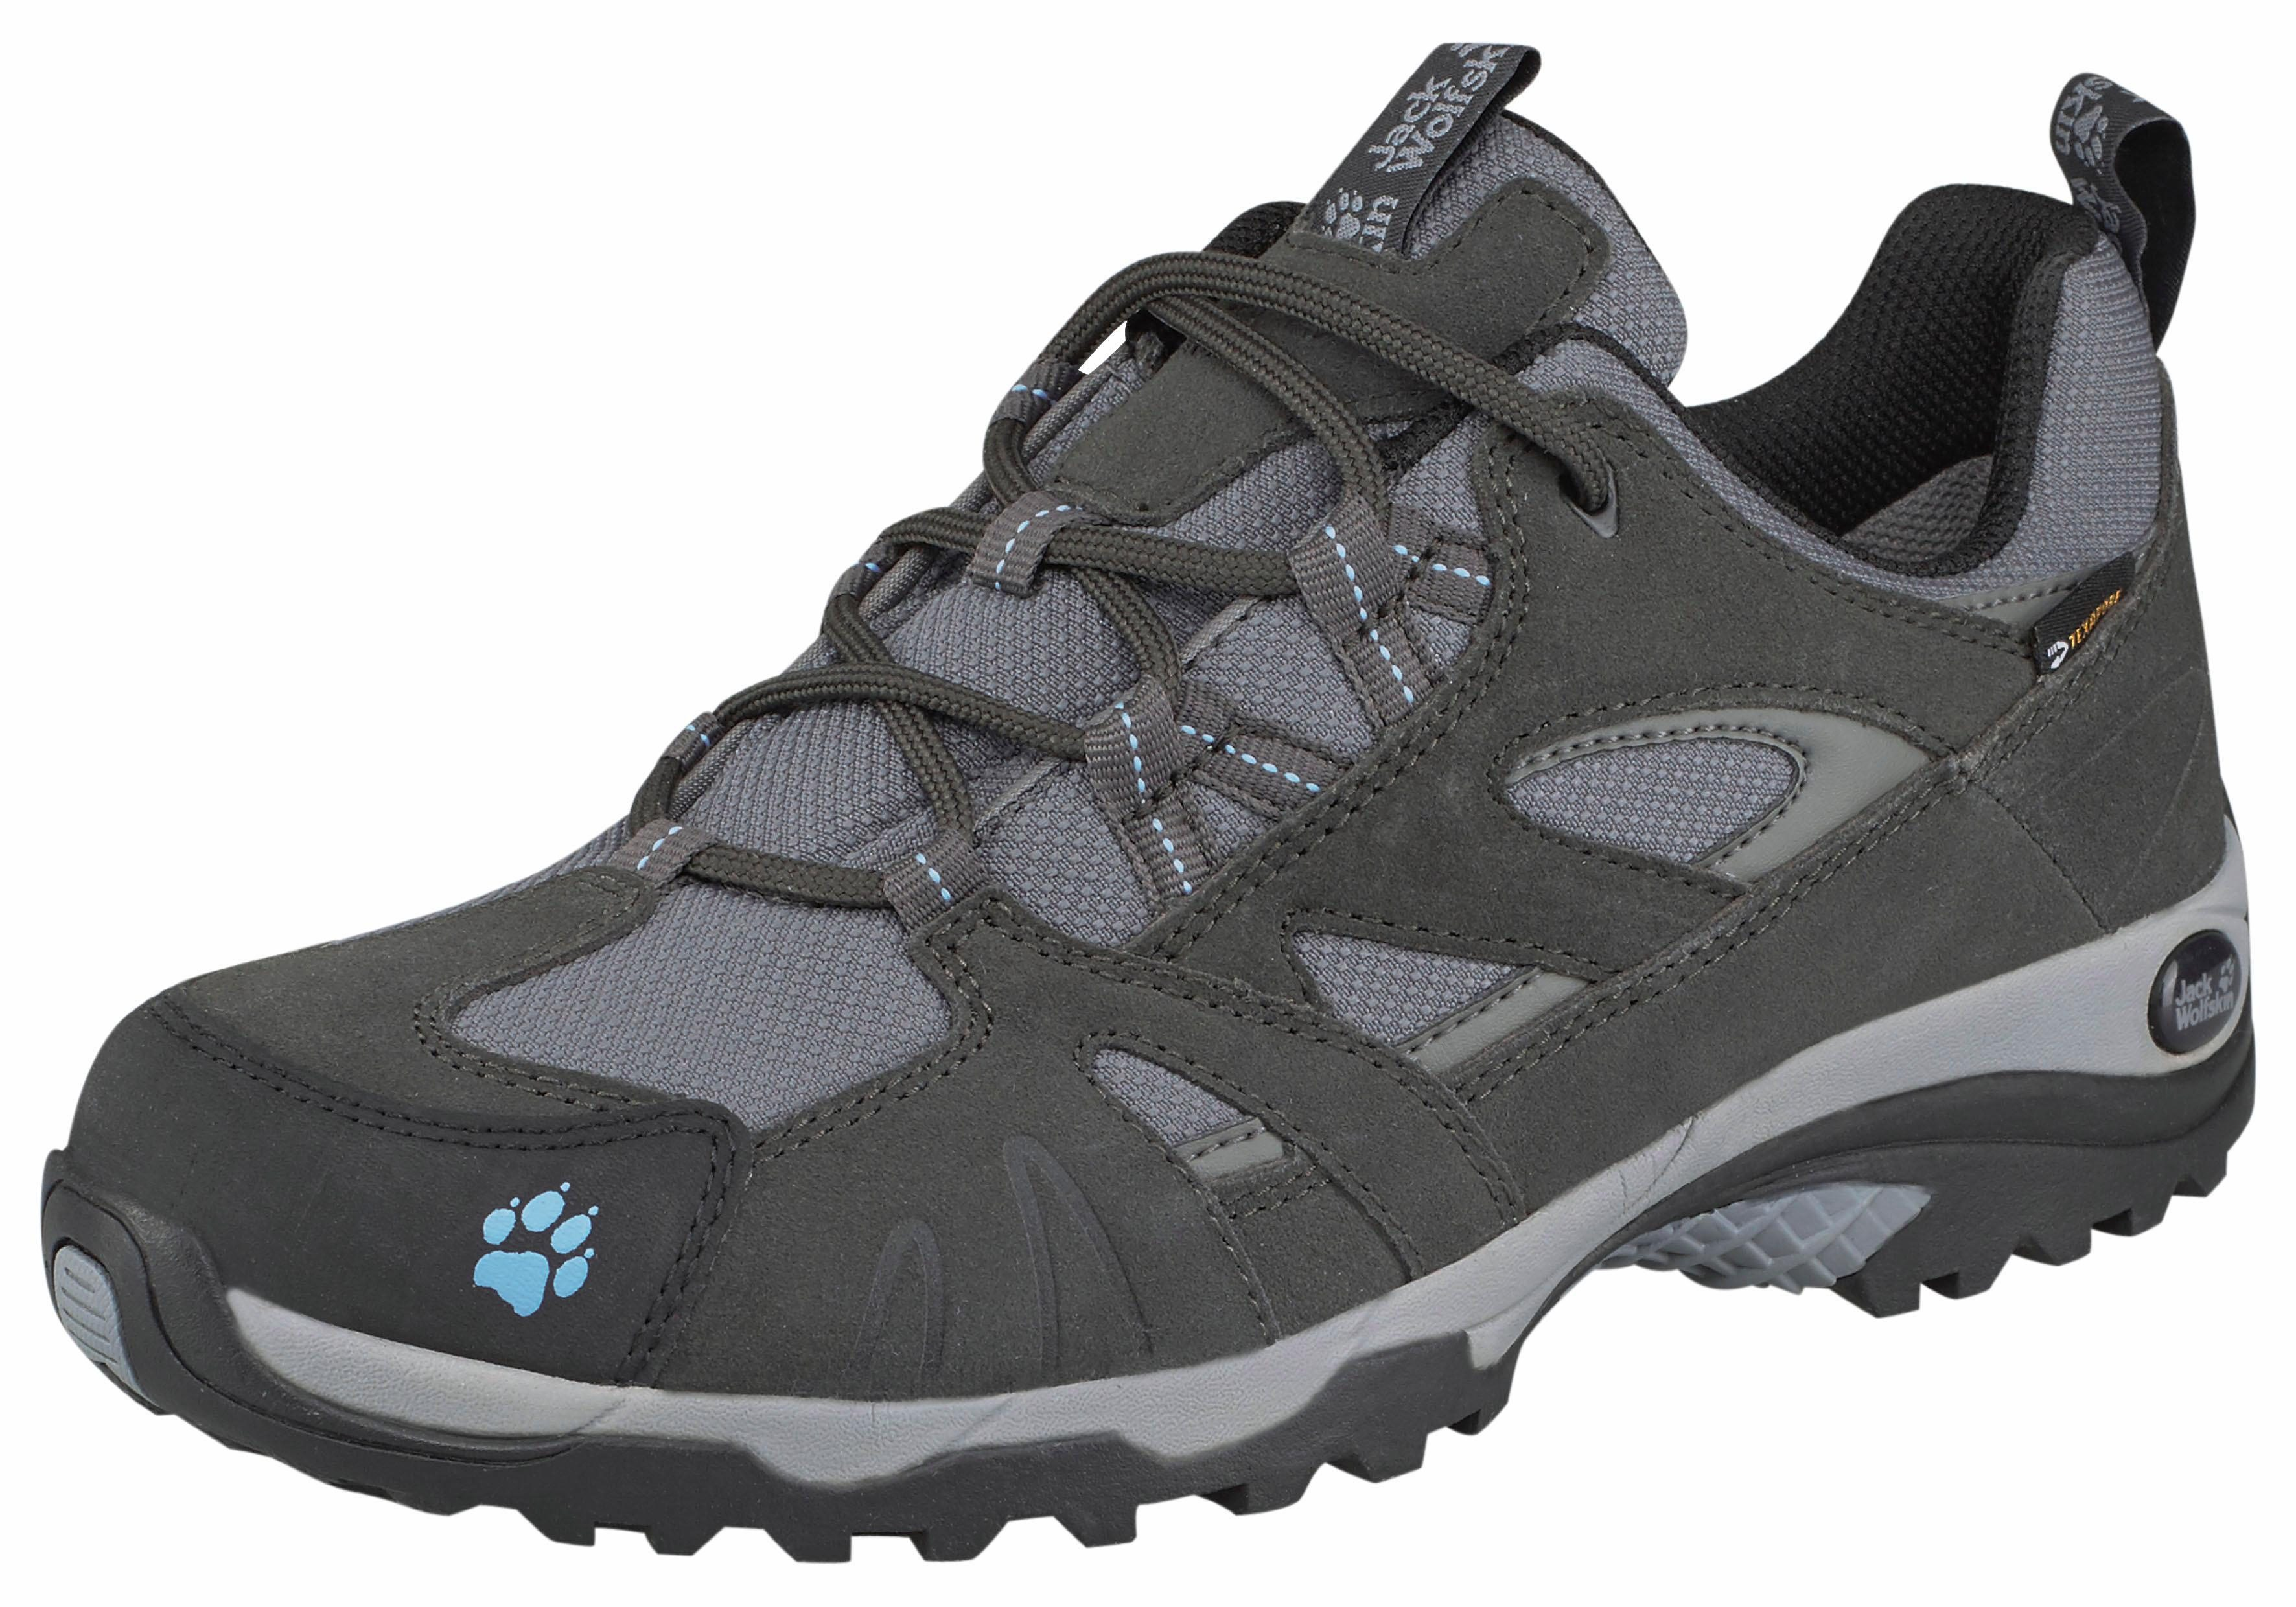 Jack Wolfskin »Vojo Hike Texapore Women« Outdoorschuh, grau, 42 42